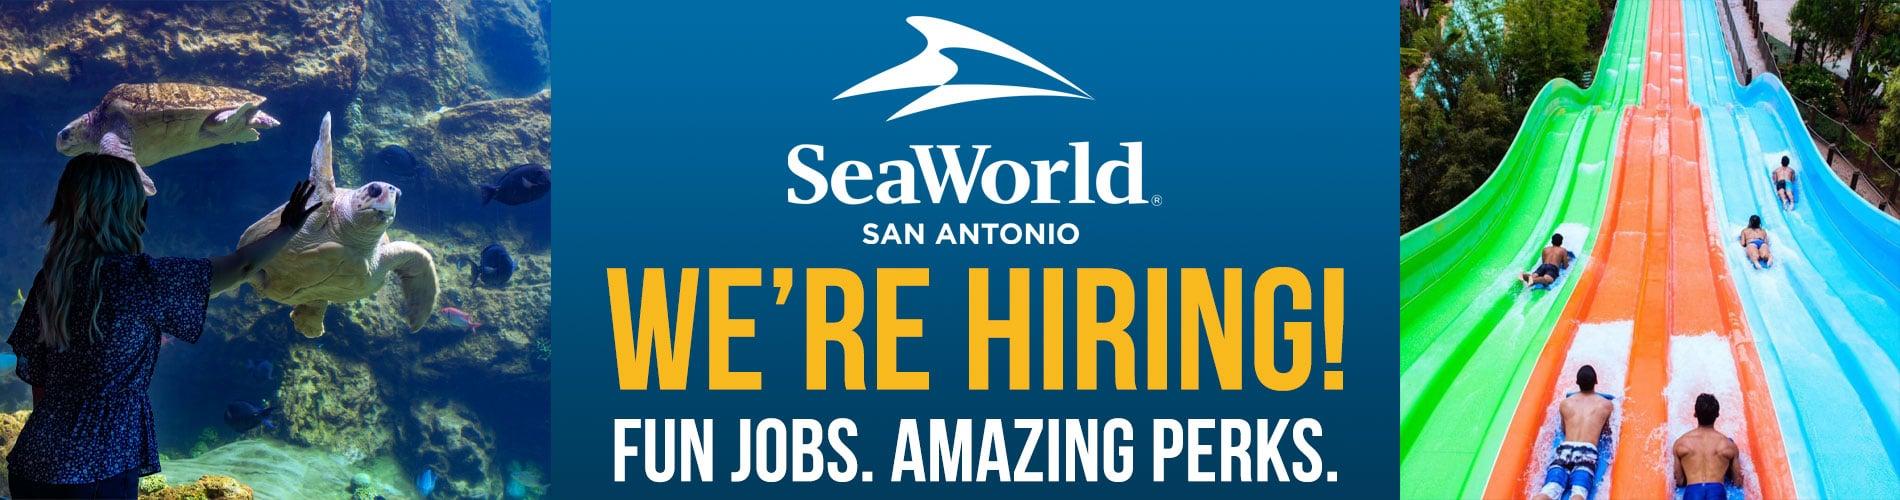 SeaWorld San Antonio is now hiring